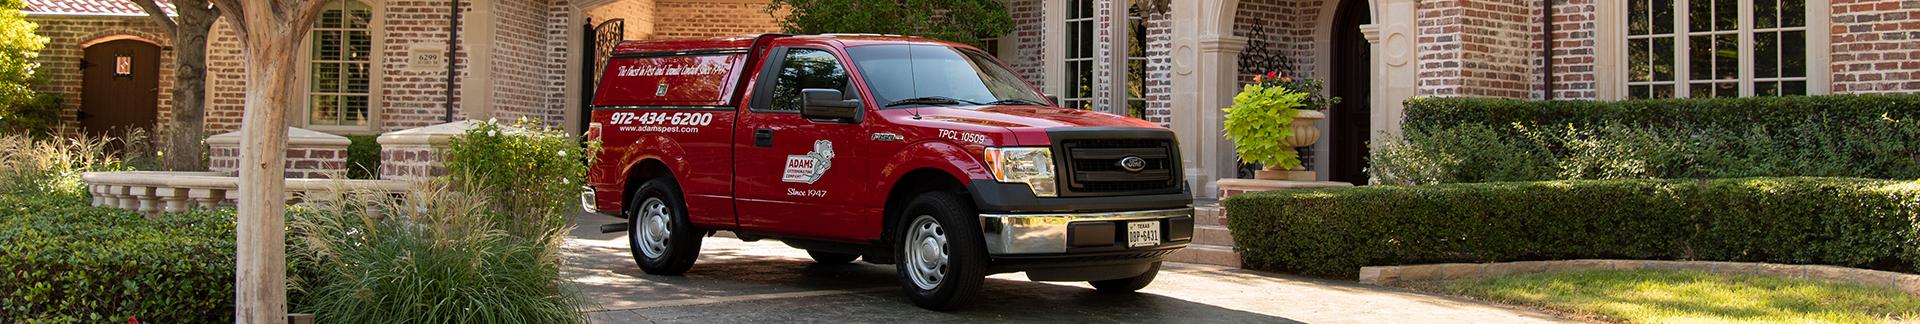 adams pest control's truck in denton tx